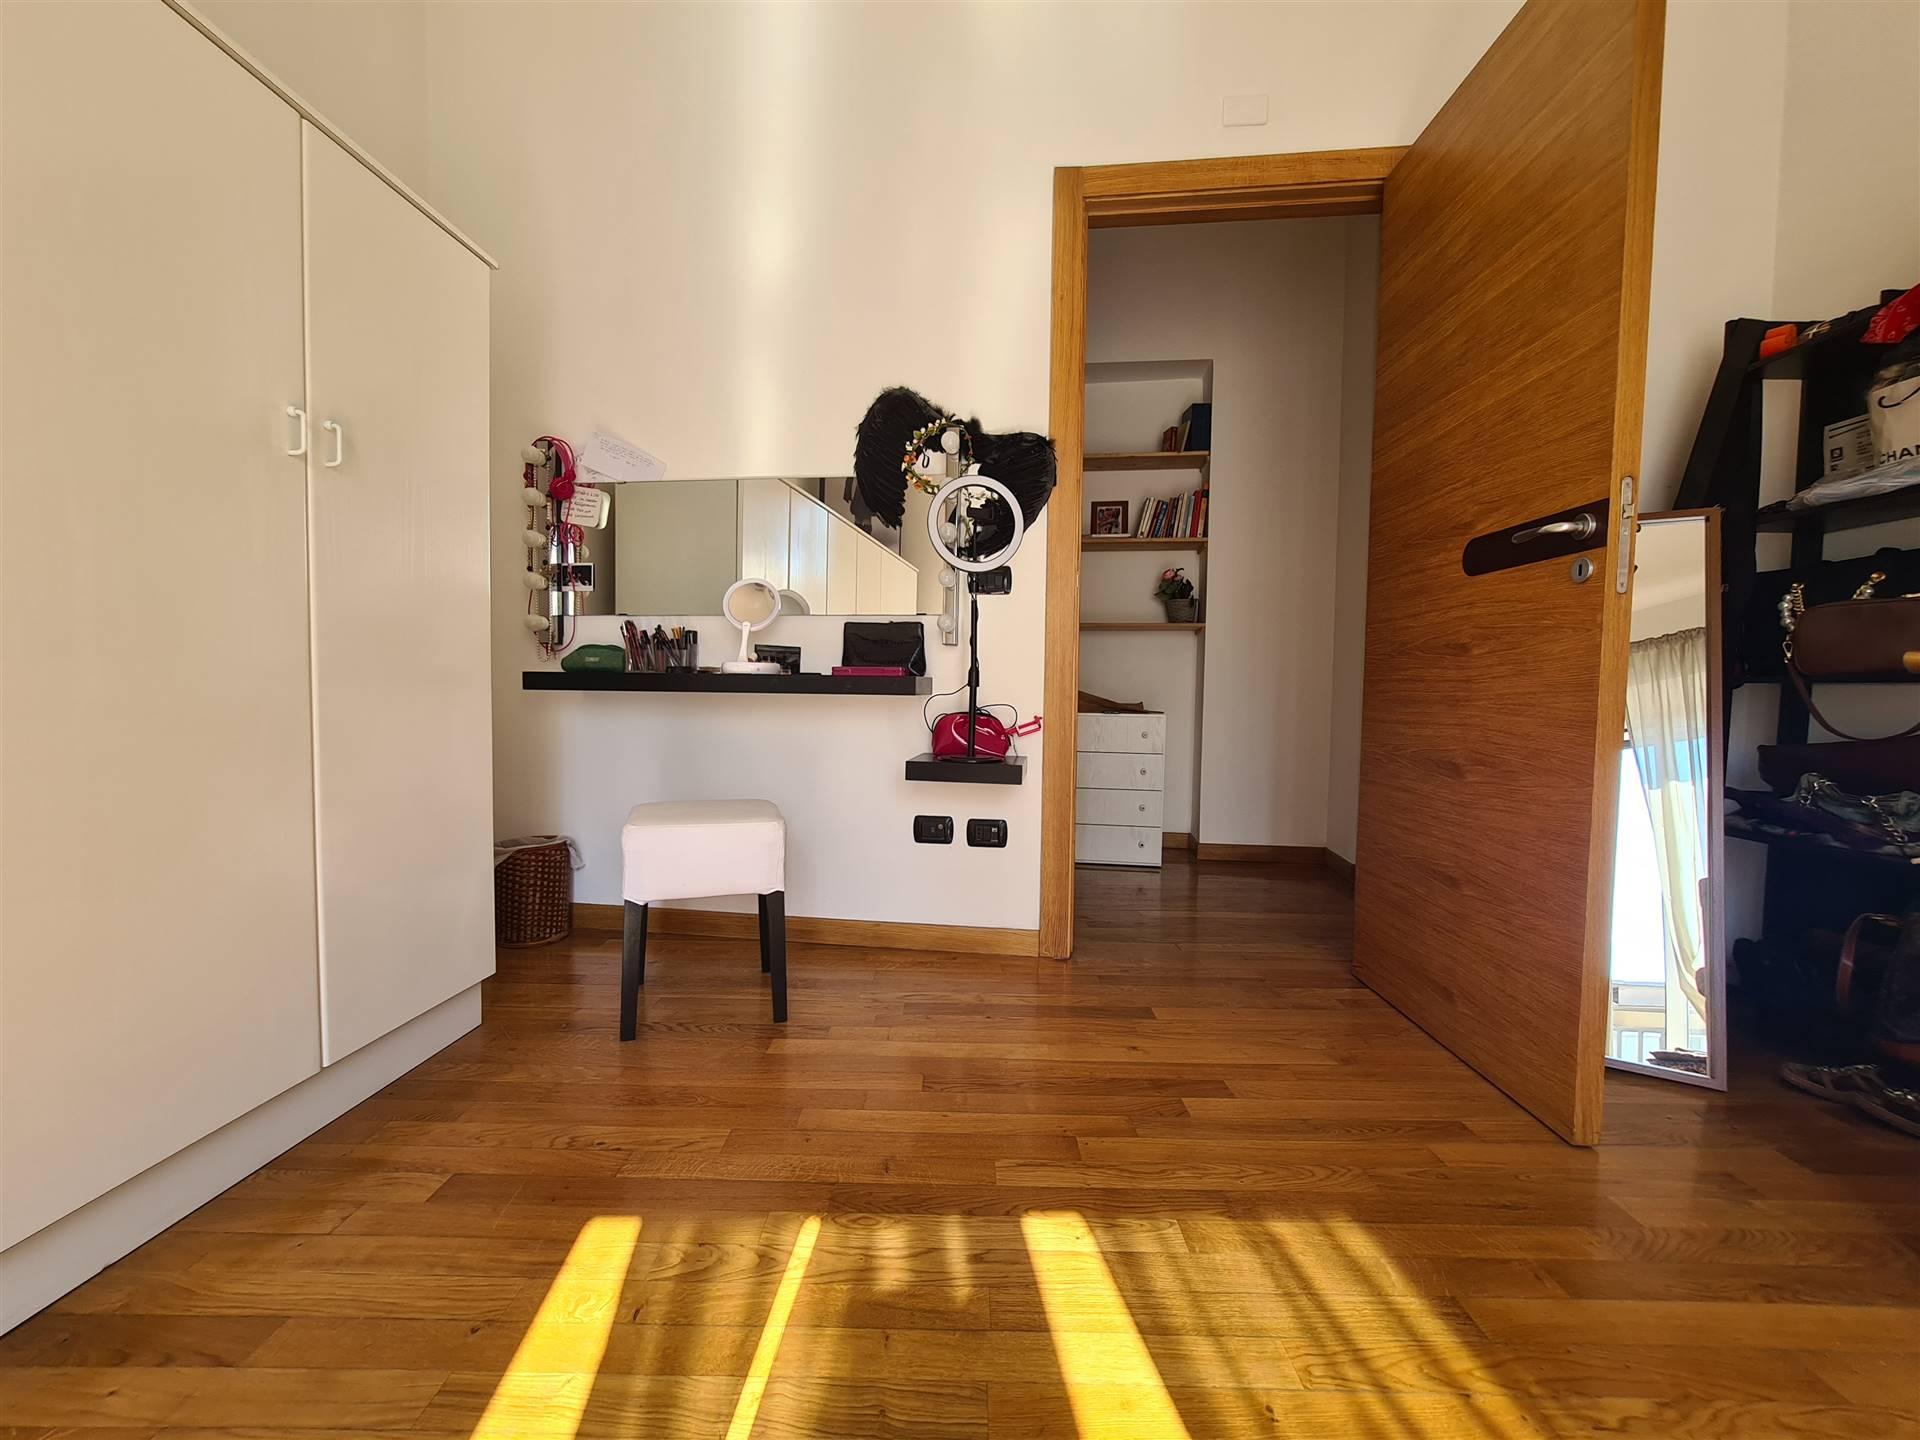 AV985-Appartamento-SANTA-MARIA-CAPUA-VETERE-Via-Roberto-d'Angiò